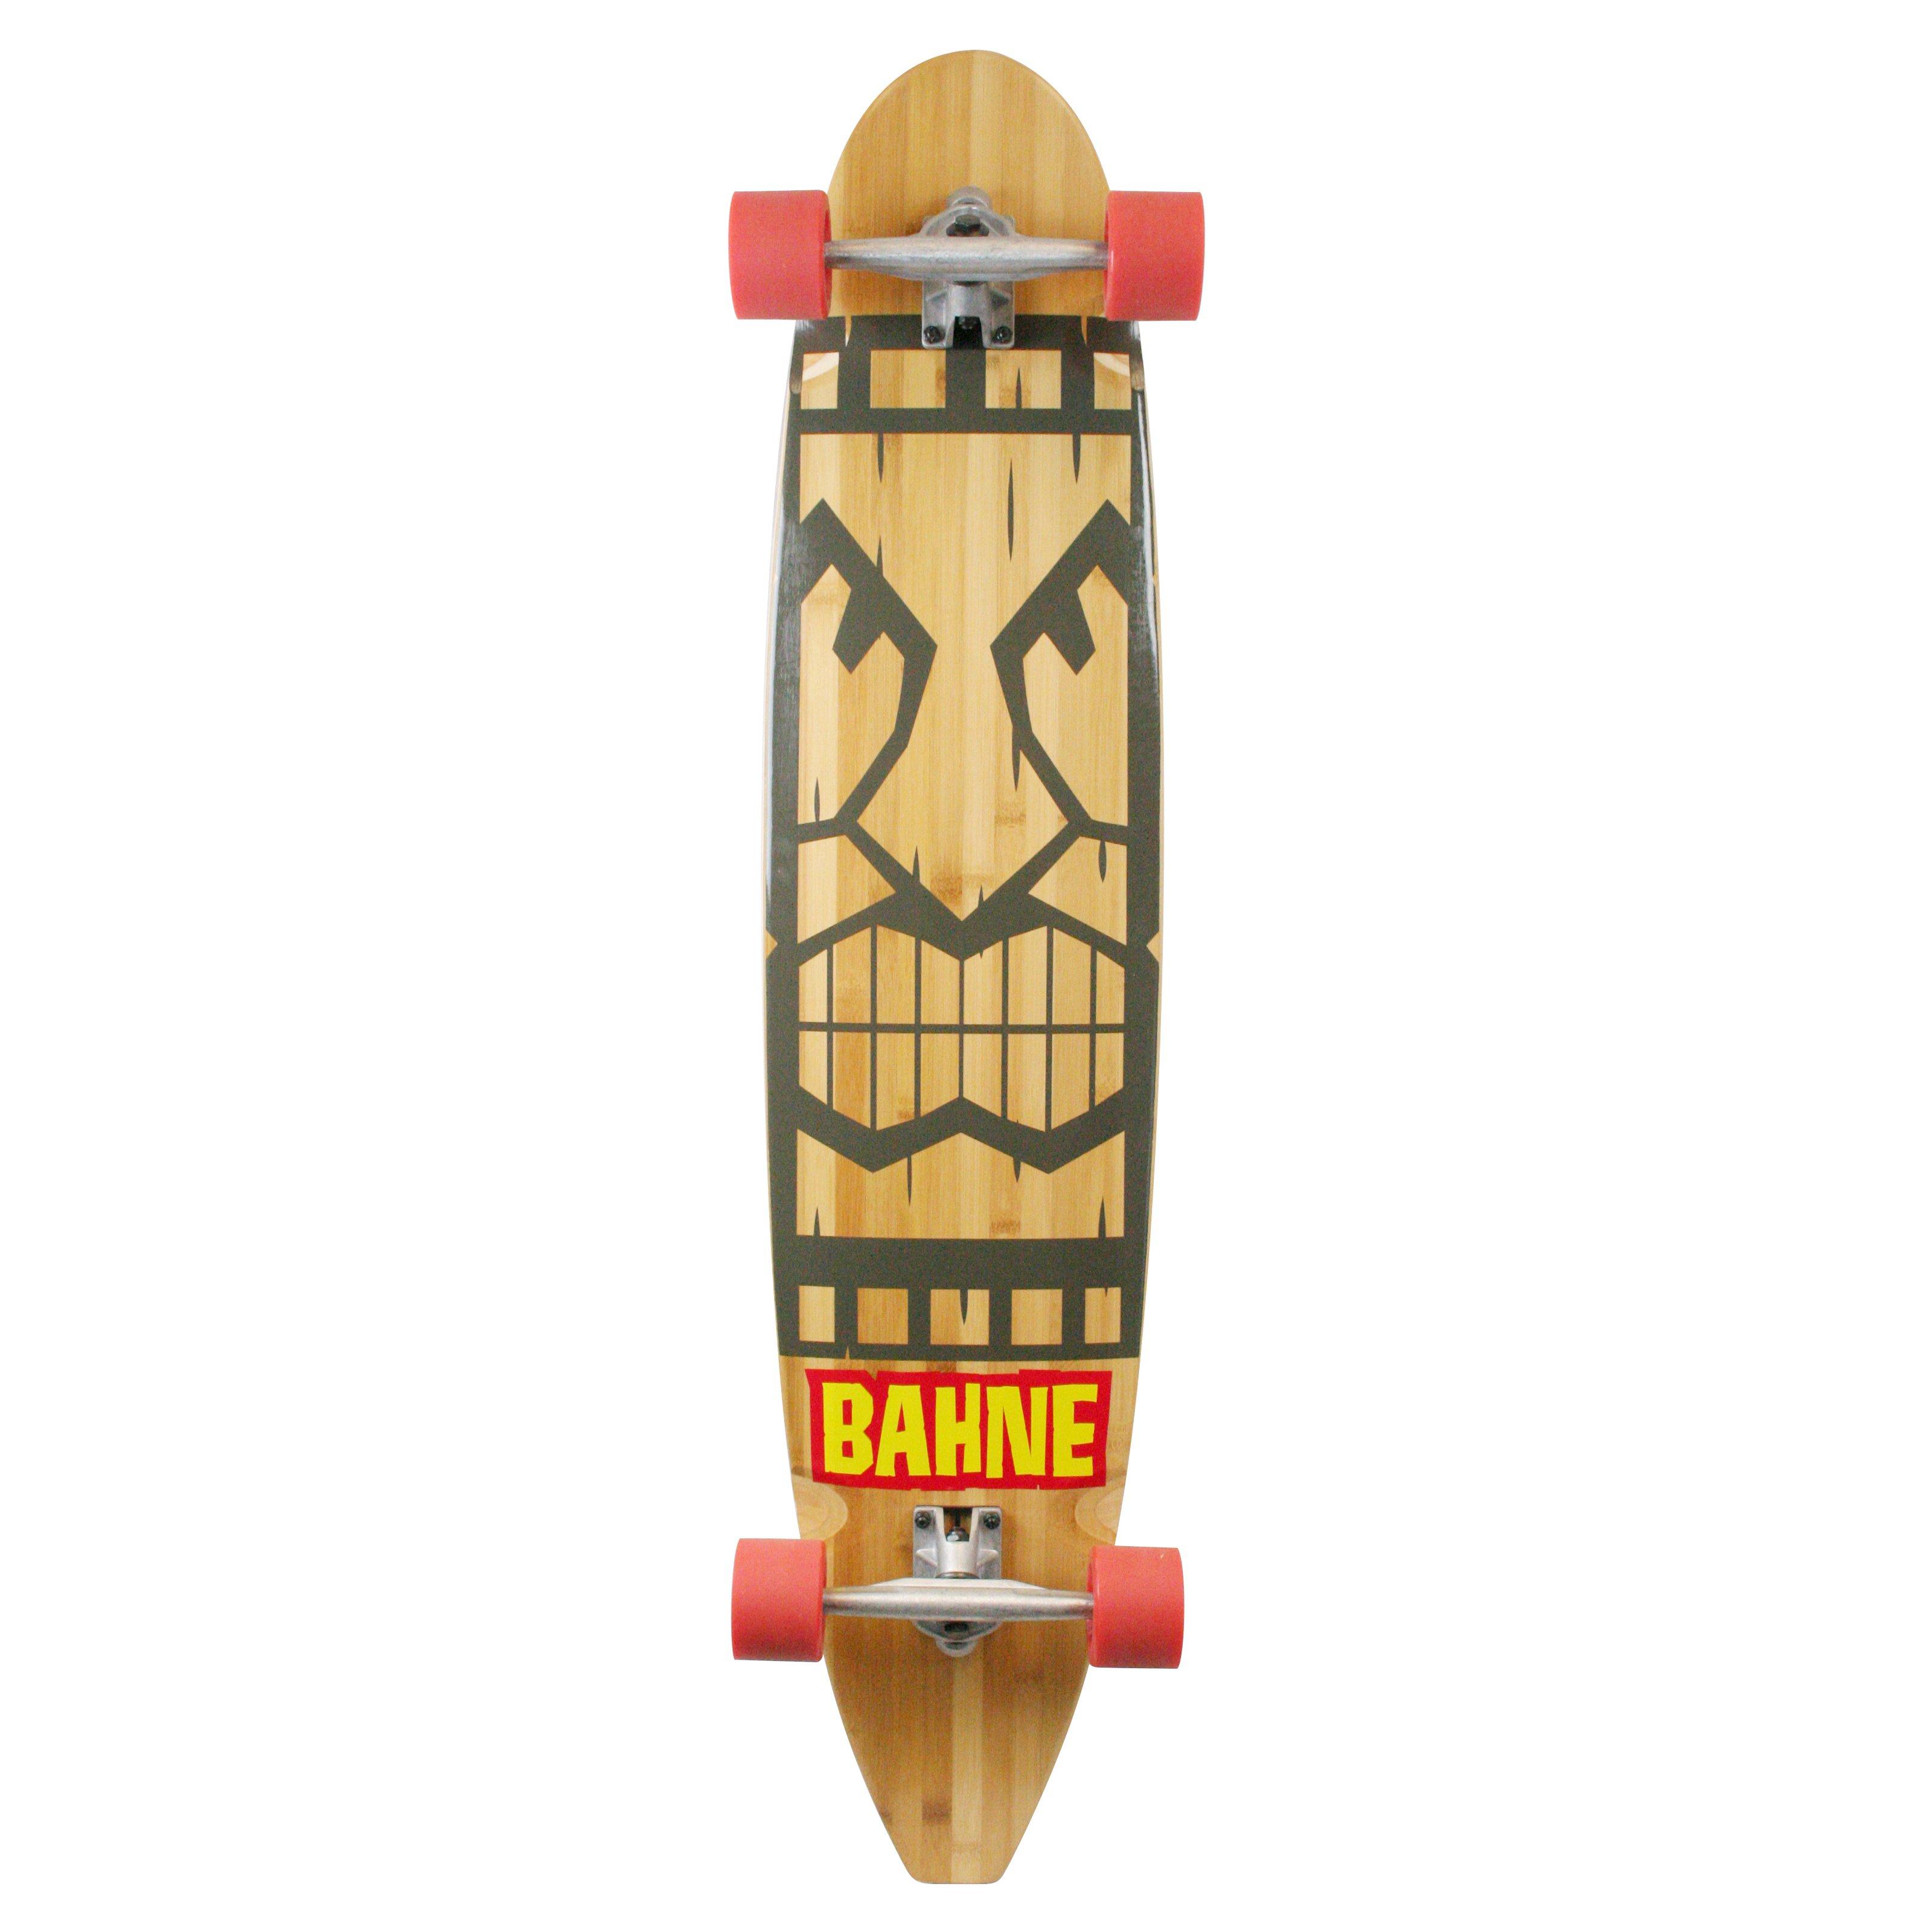 Made in Mars Bahne Bamboo Tiki Classic LongBoard Skateboard